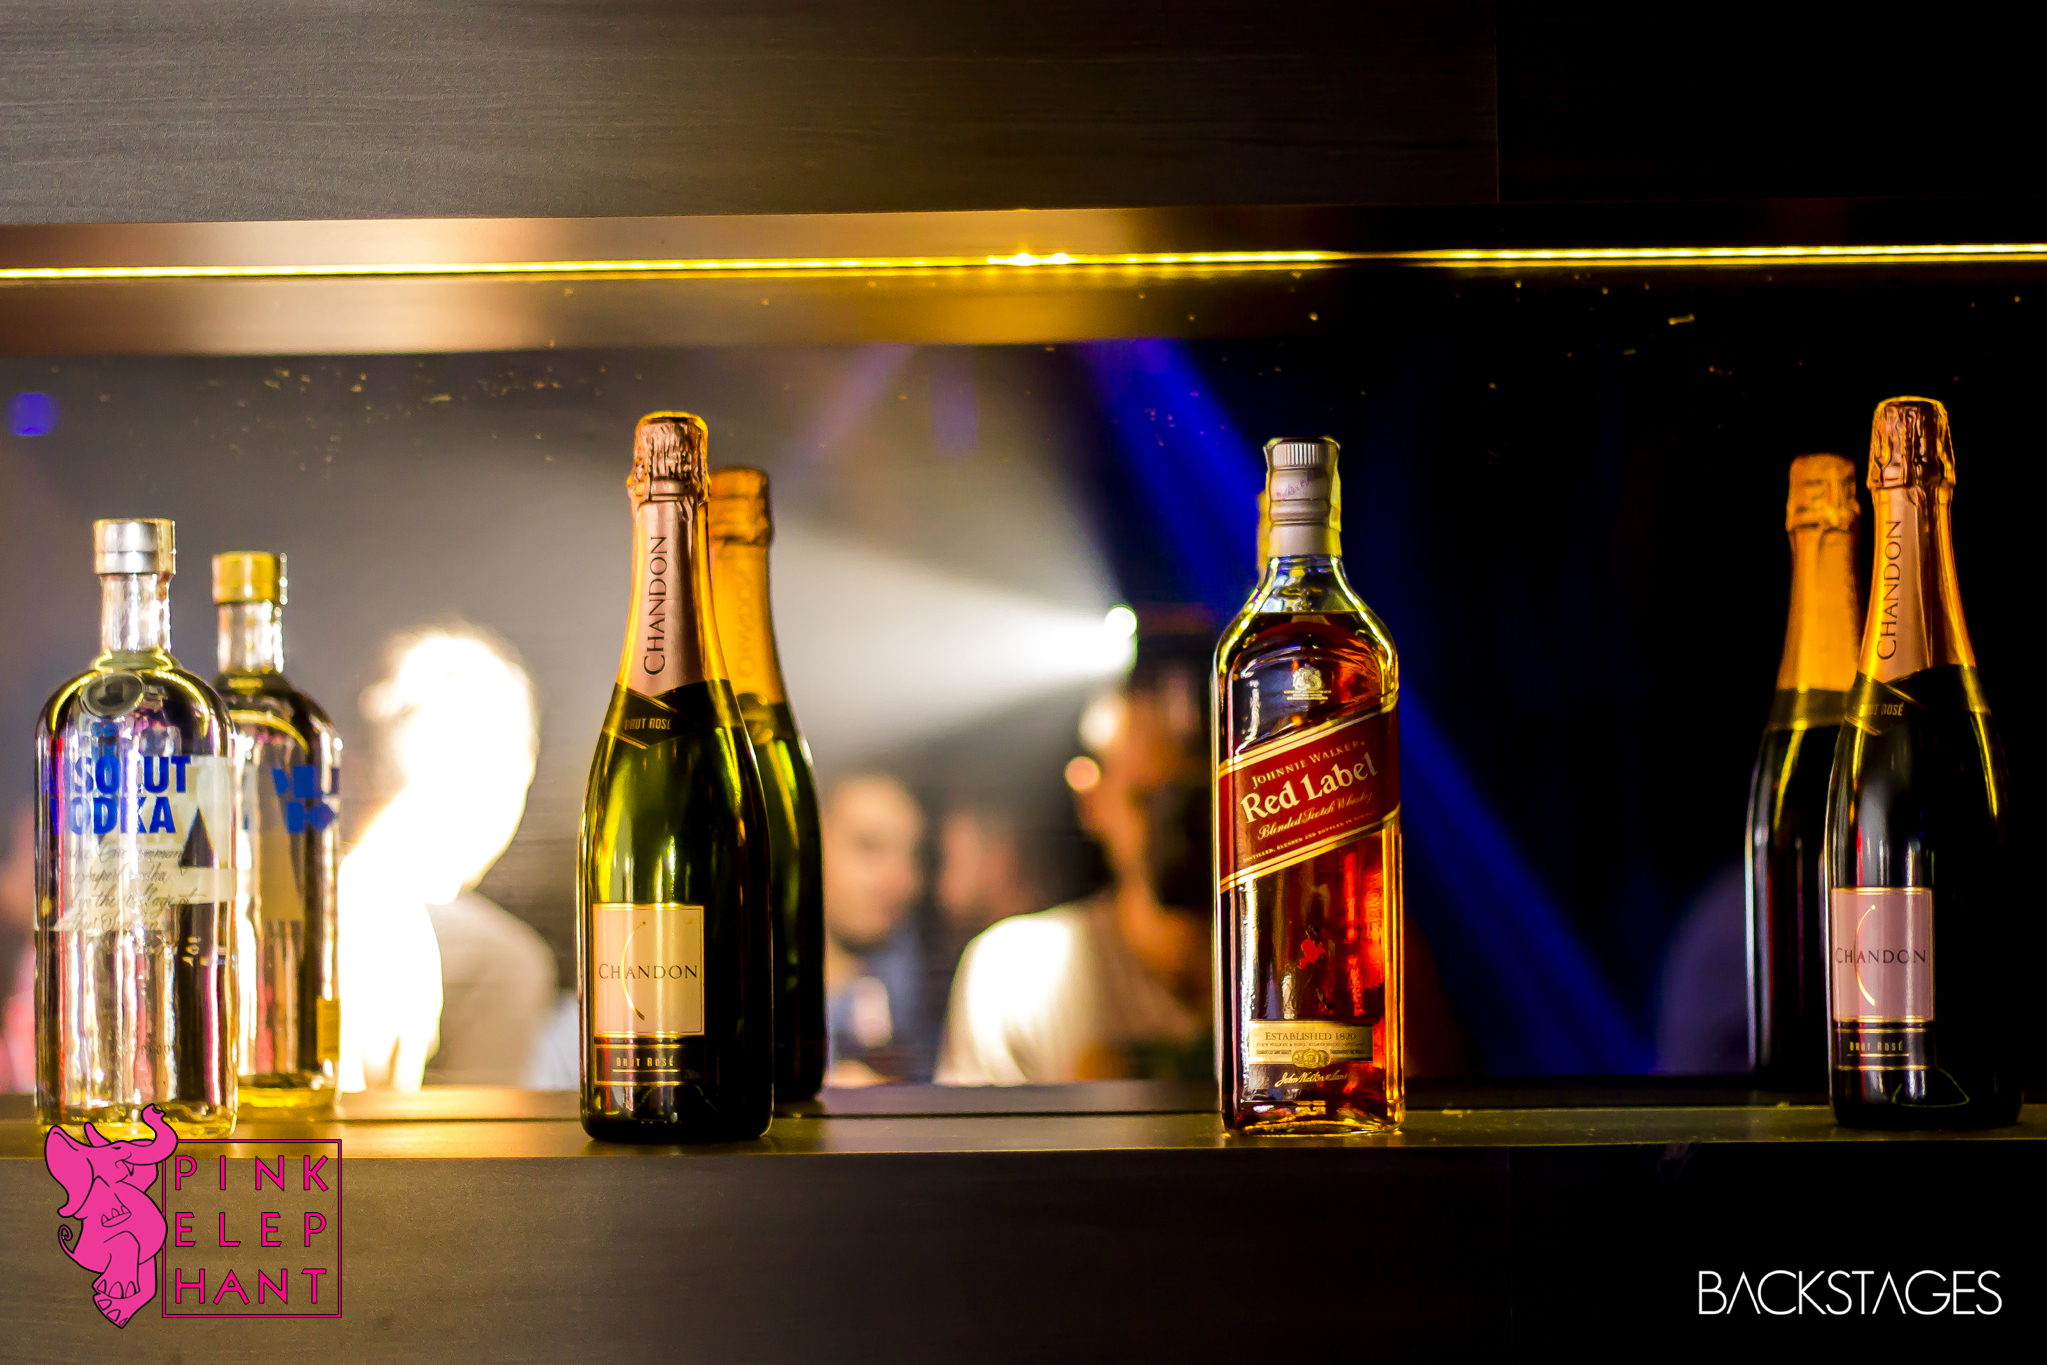 Pink-elephant-club-sorocaba-revista-backstages-foto-kenzi-marinho (37)